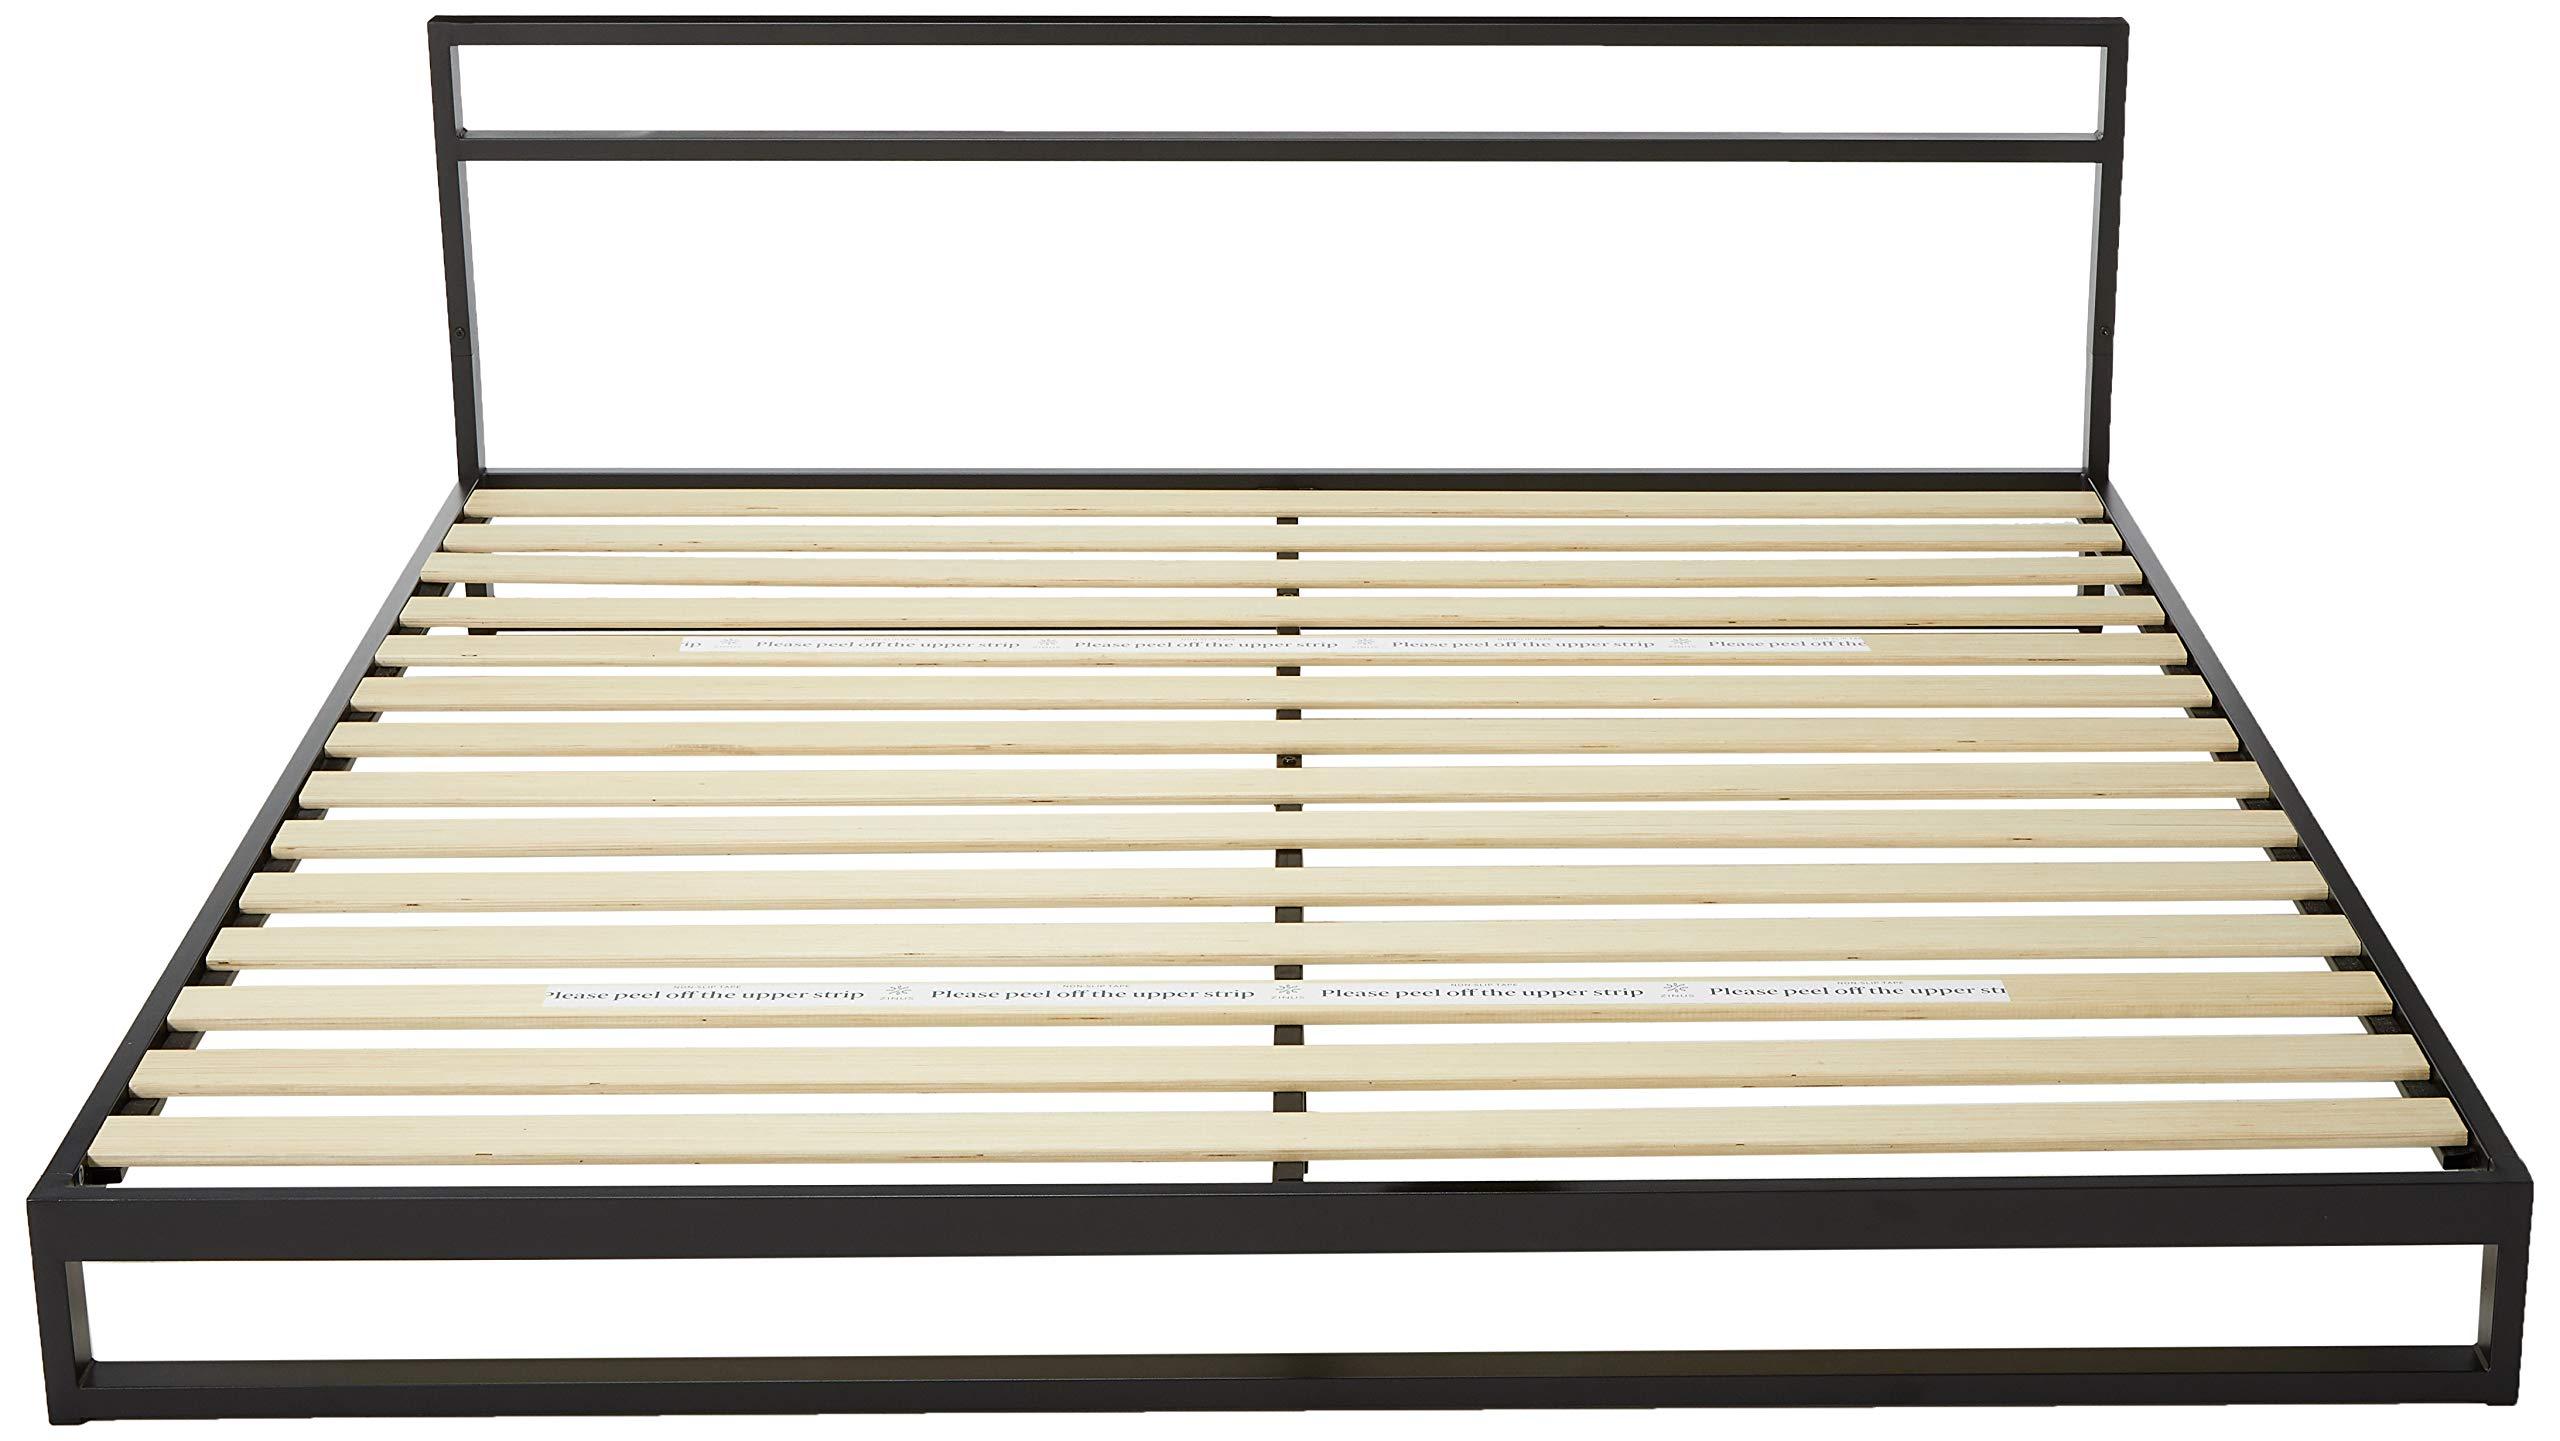 Zinus Trisha 7 Inch Heavy Duty Low Profile Platforma Bed Frame / Mattress Foundation / Box Spring Optional / Wood Slat…